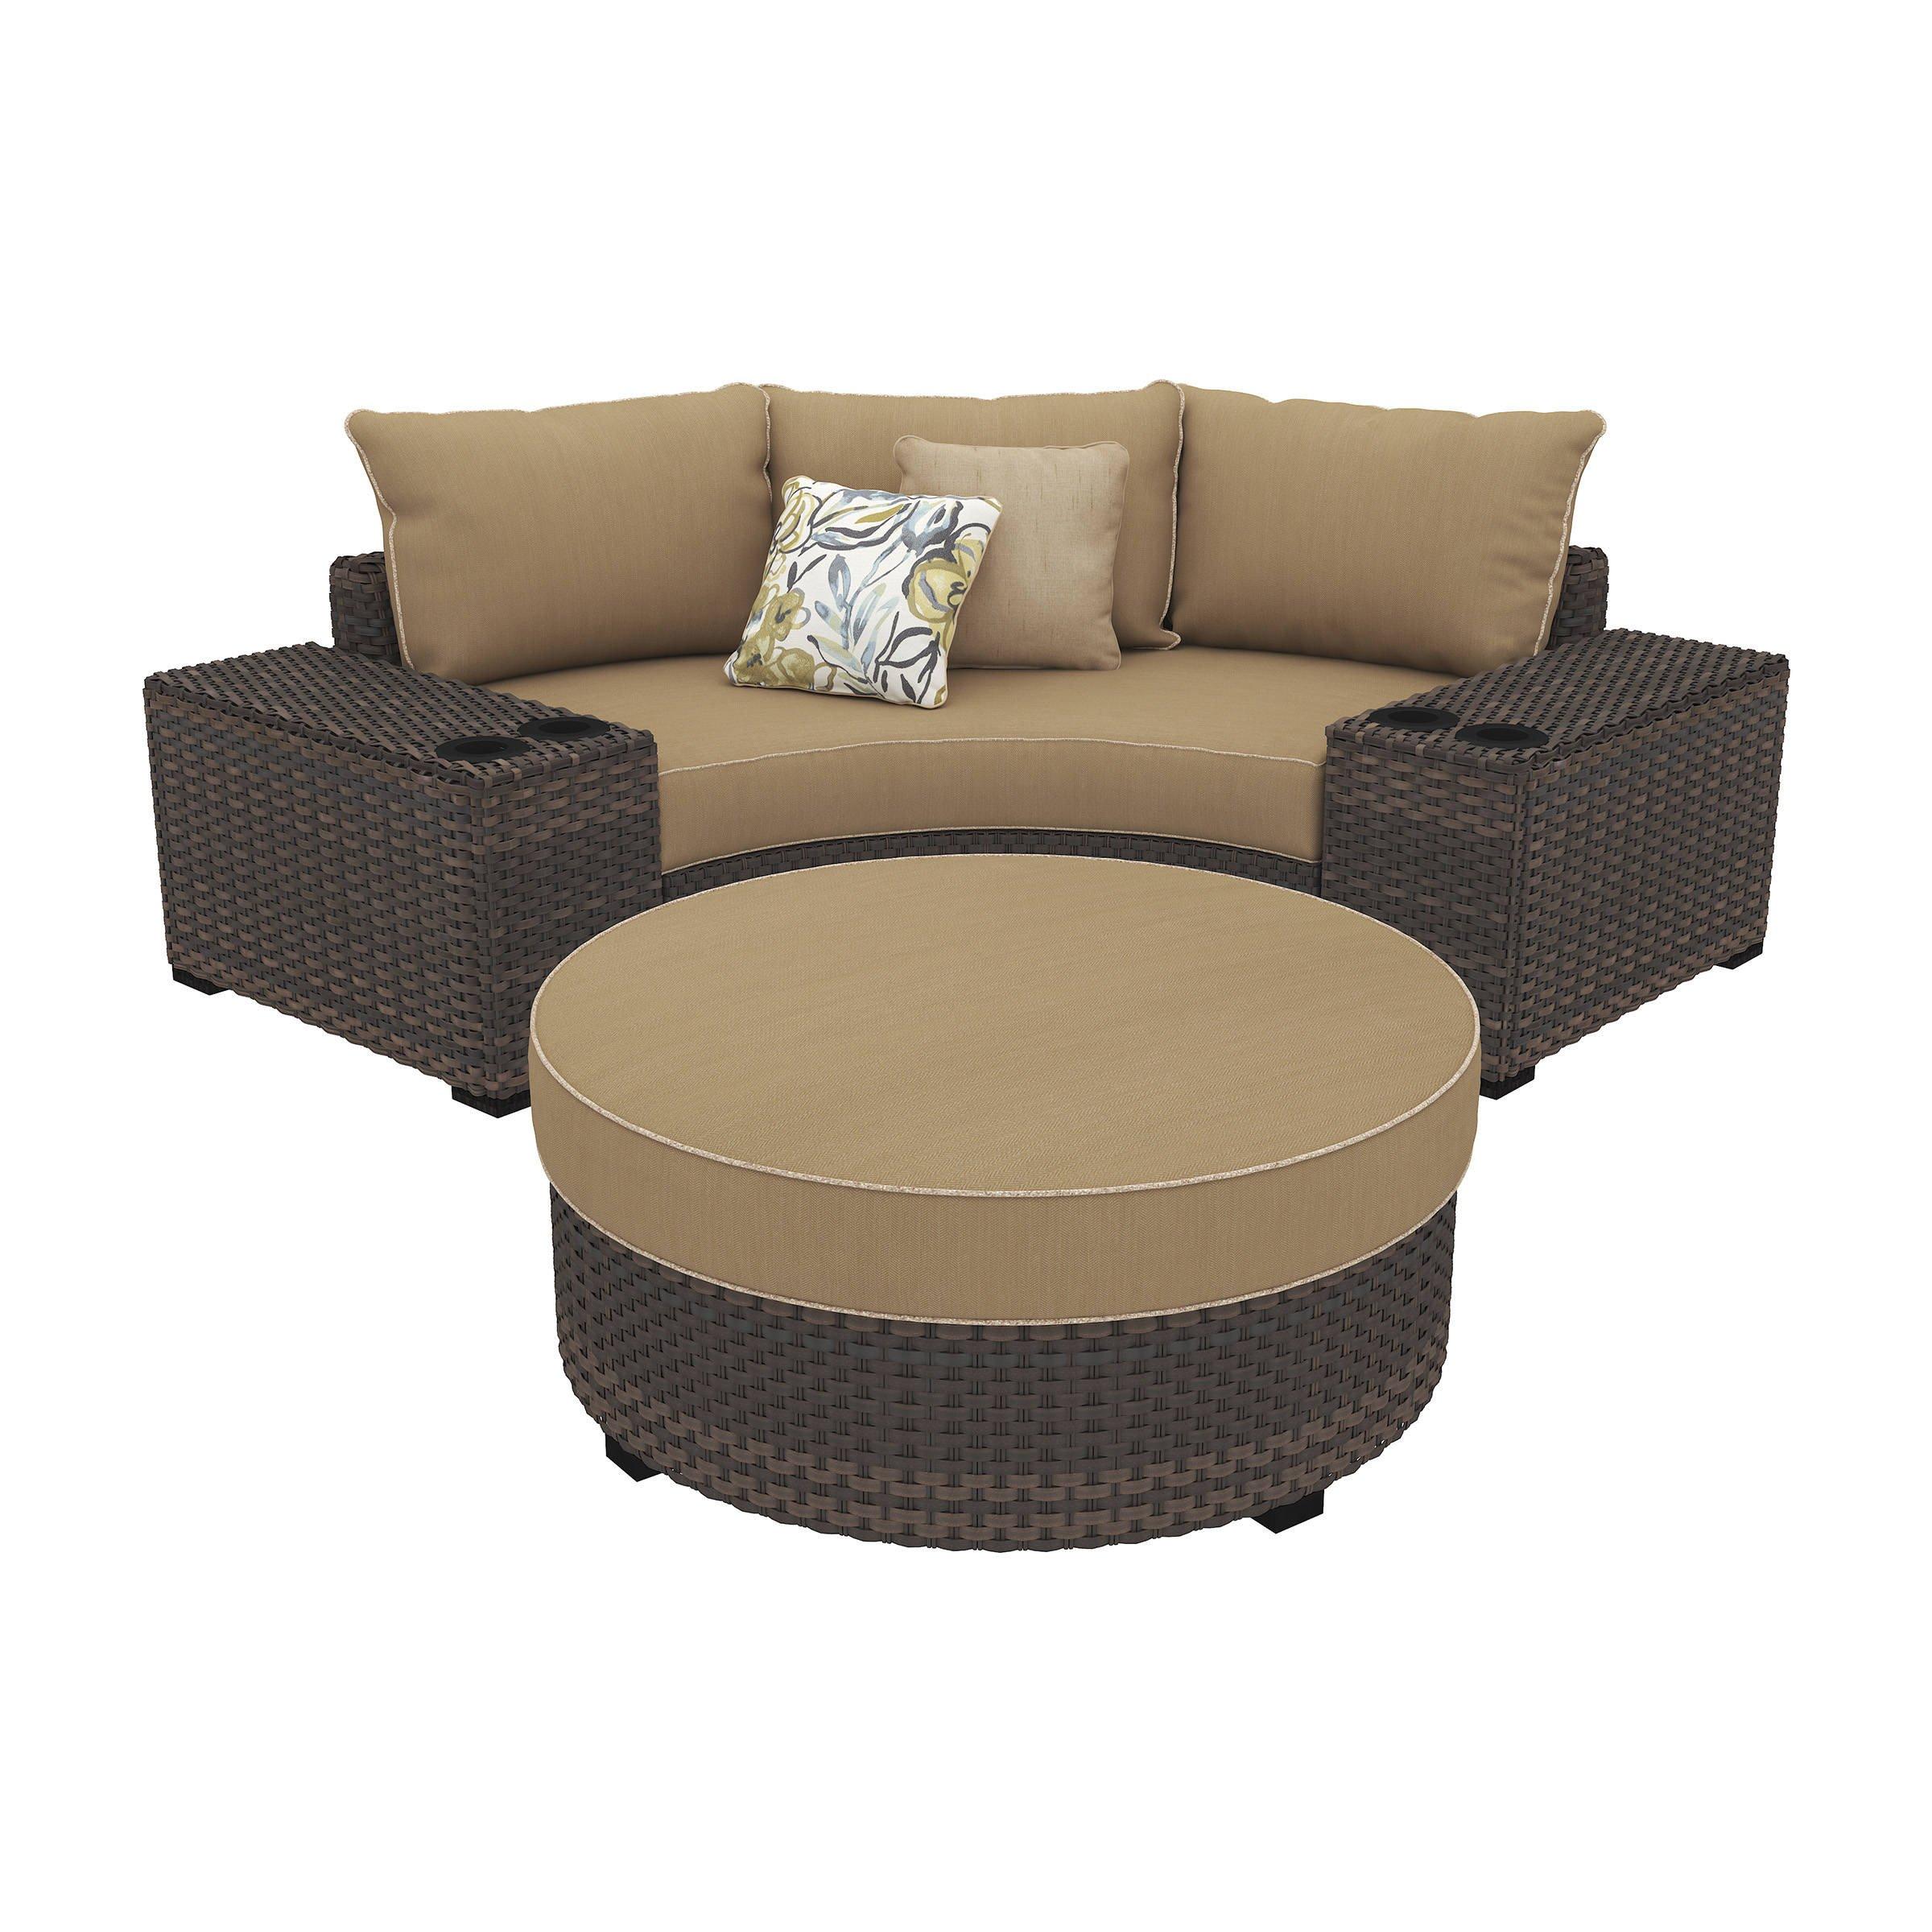 Ashley Furniture Bedroom Set 14 Piece Fresh ashley Furniture Spring Ridge Beige Corner Chair and Ottoman